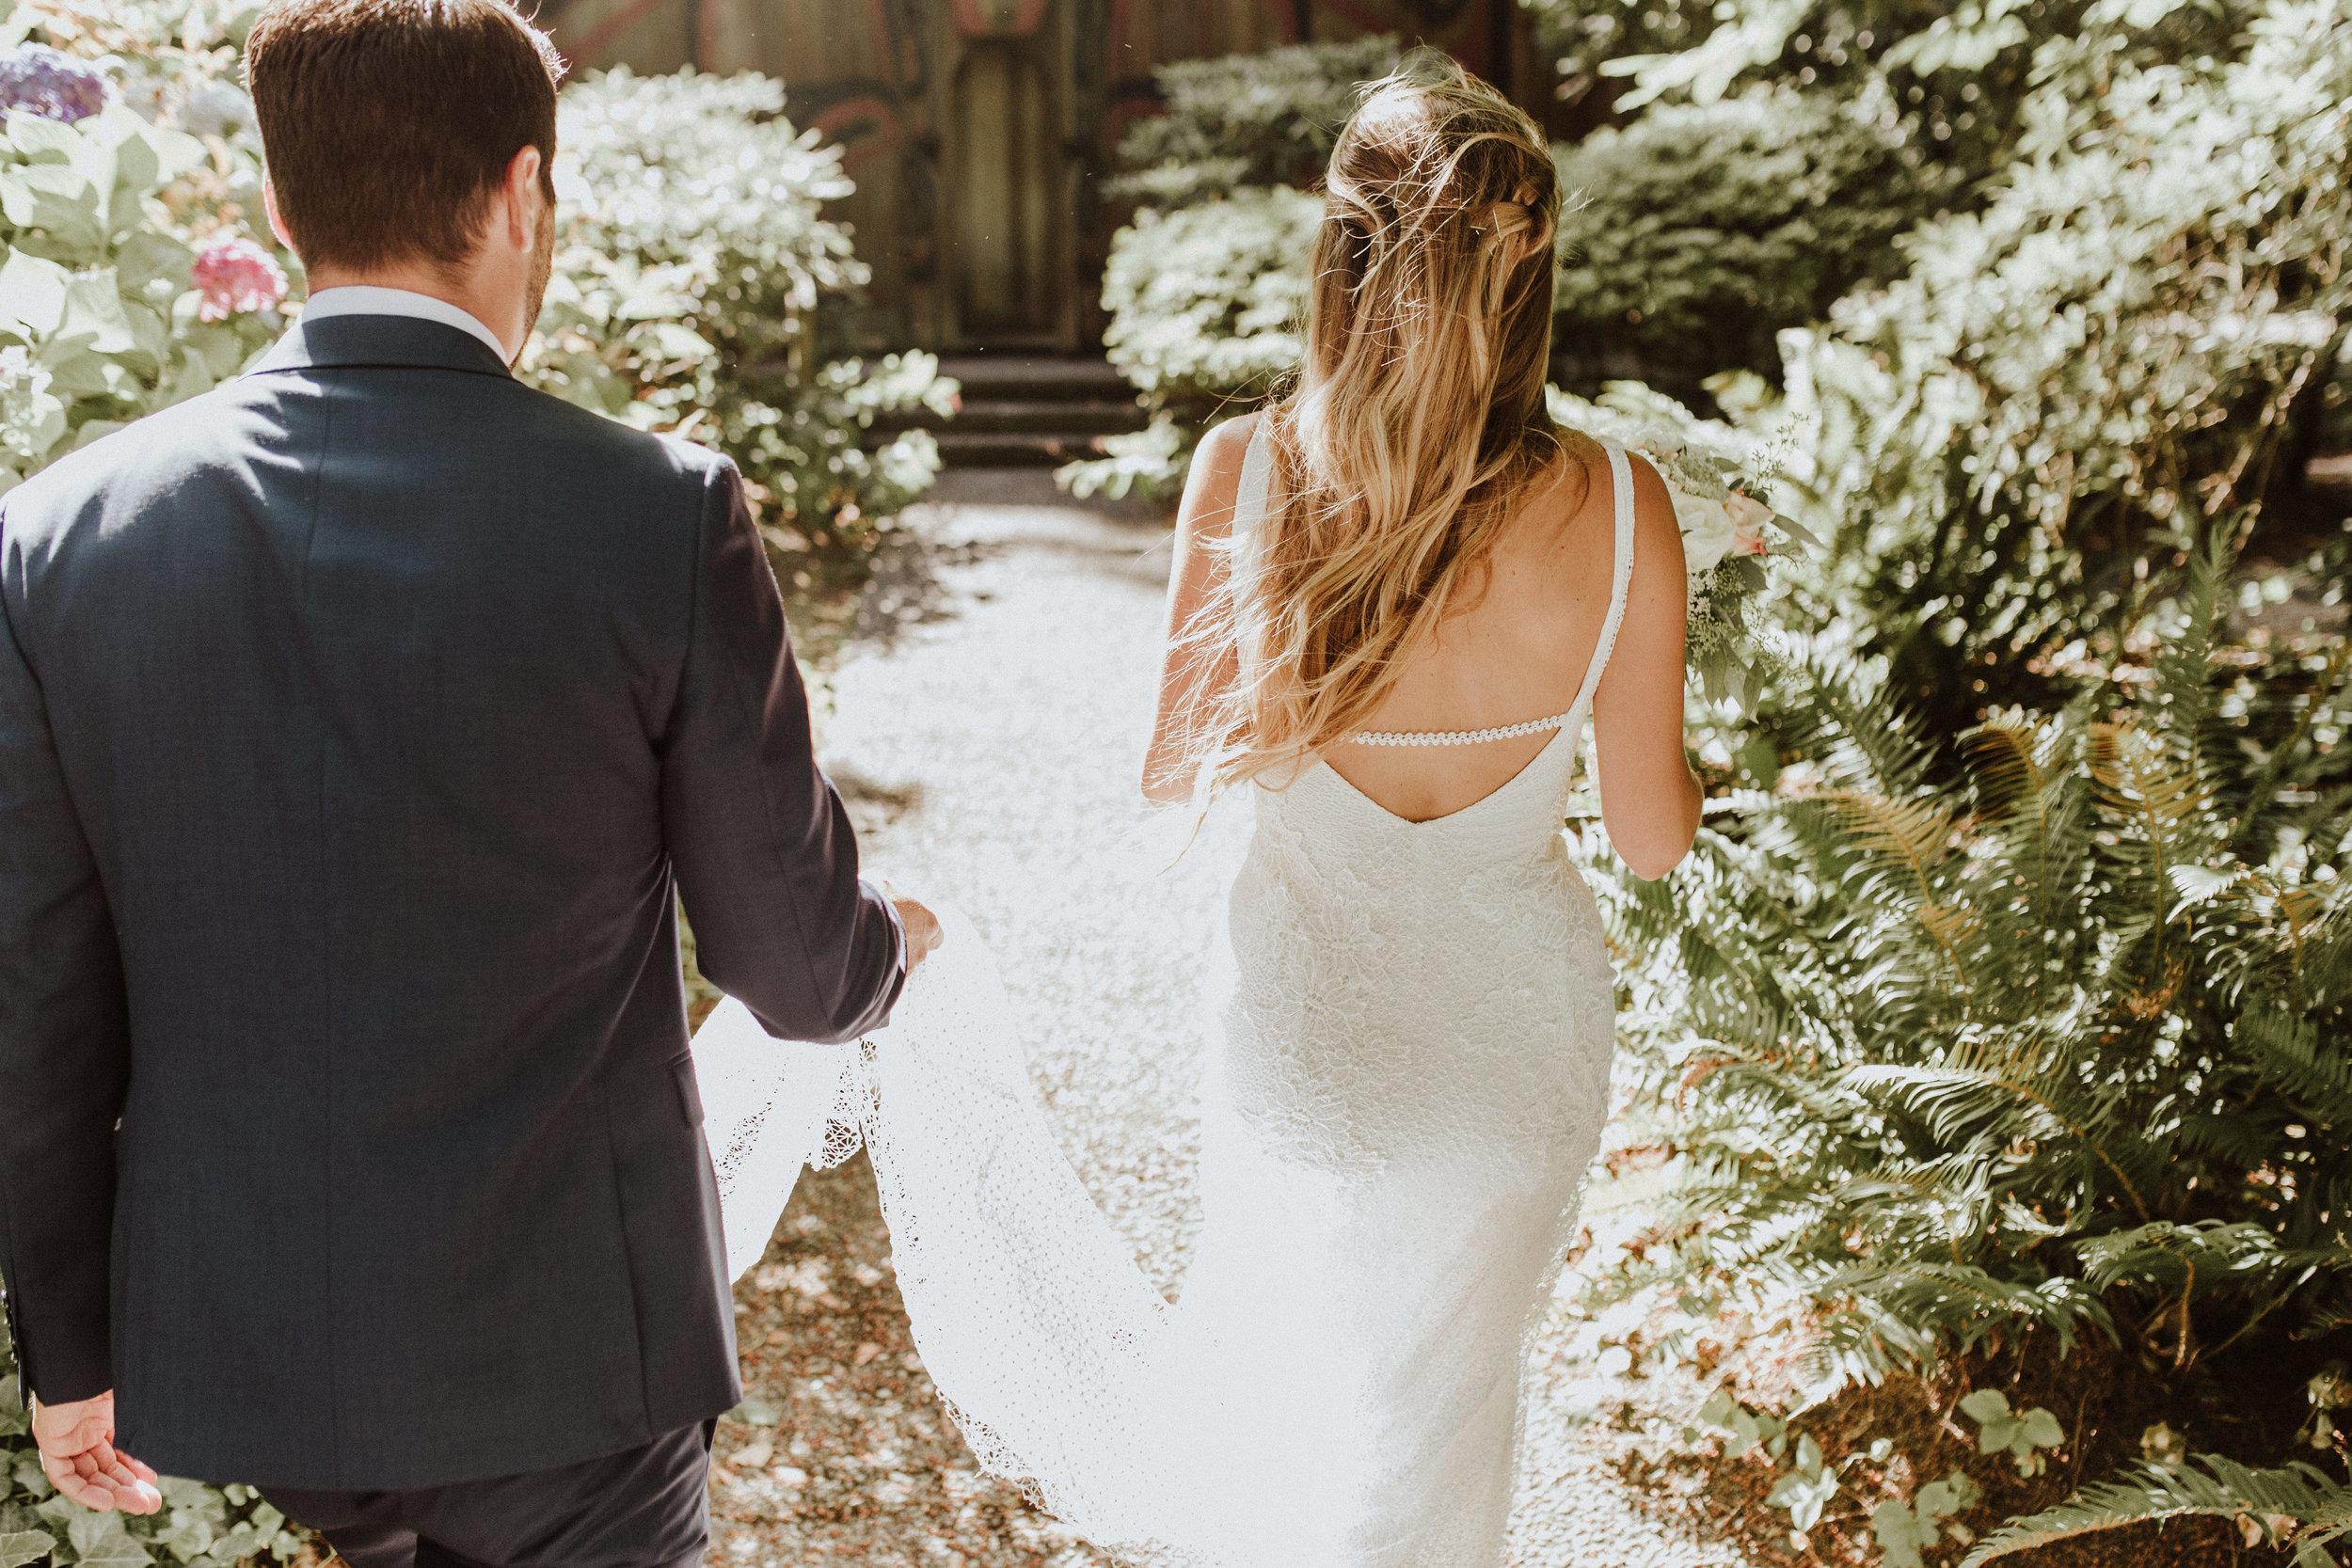 kiana lodge wedding dress